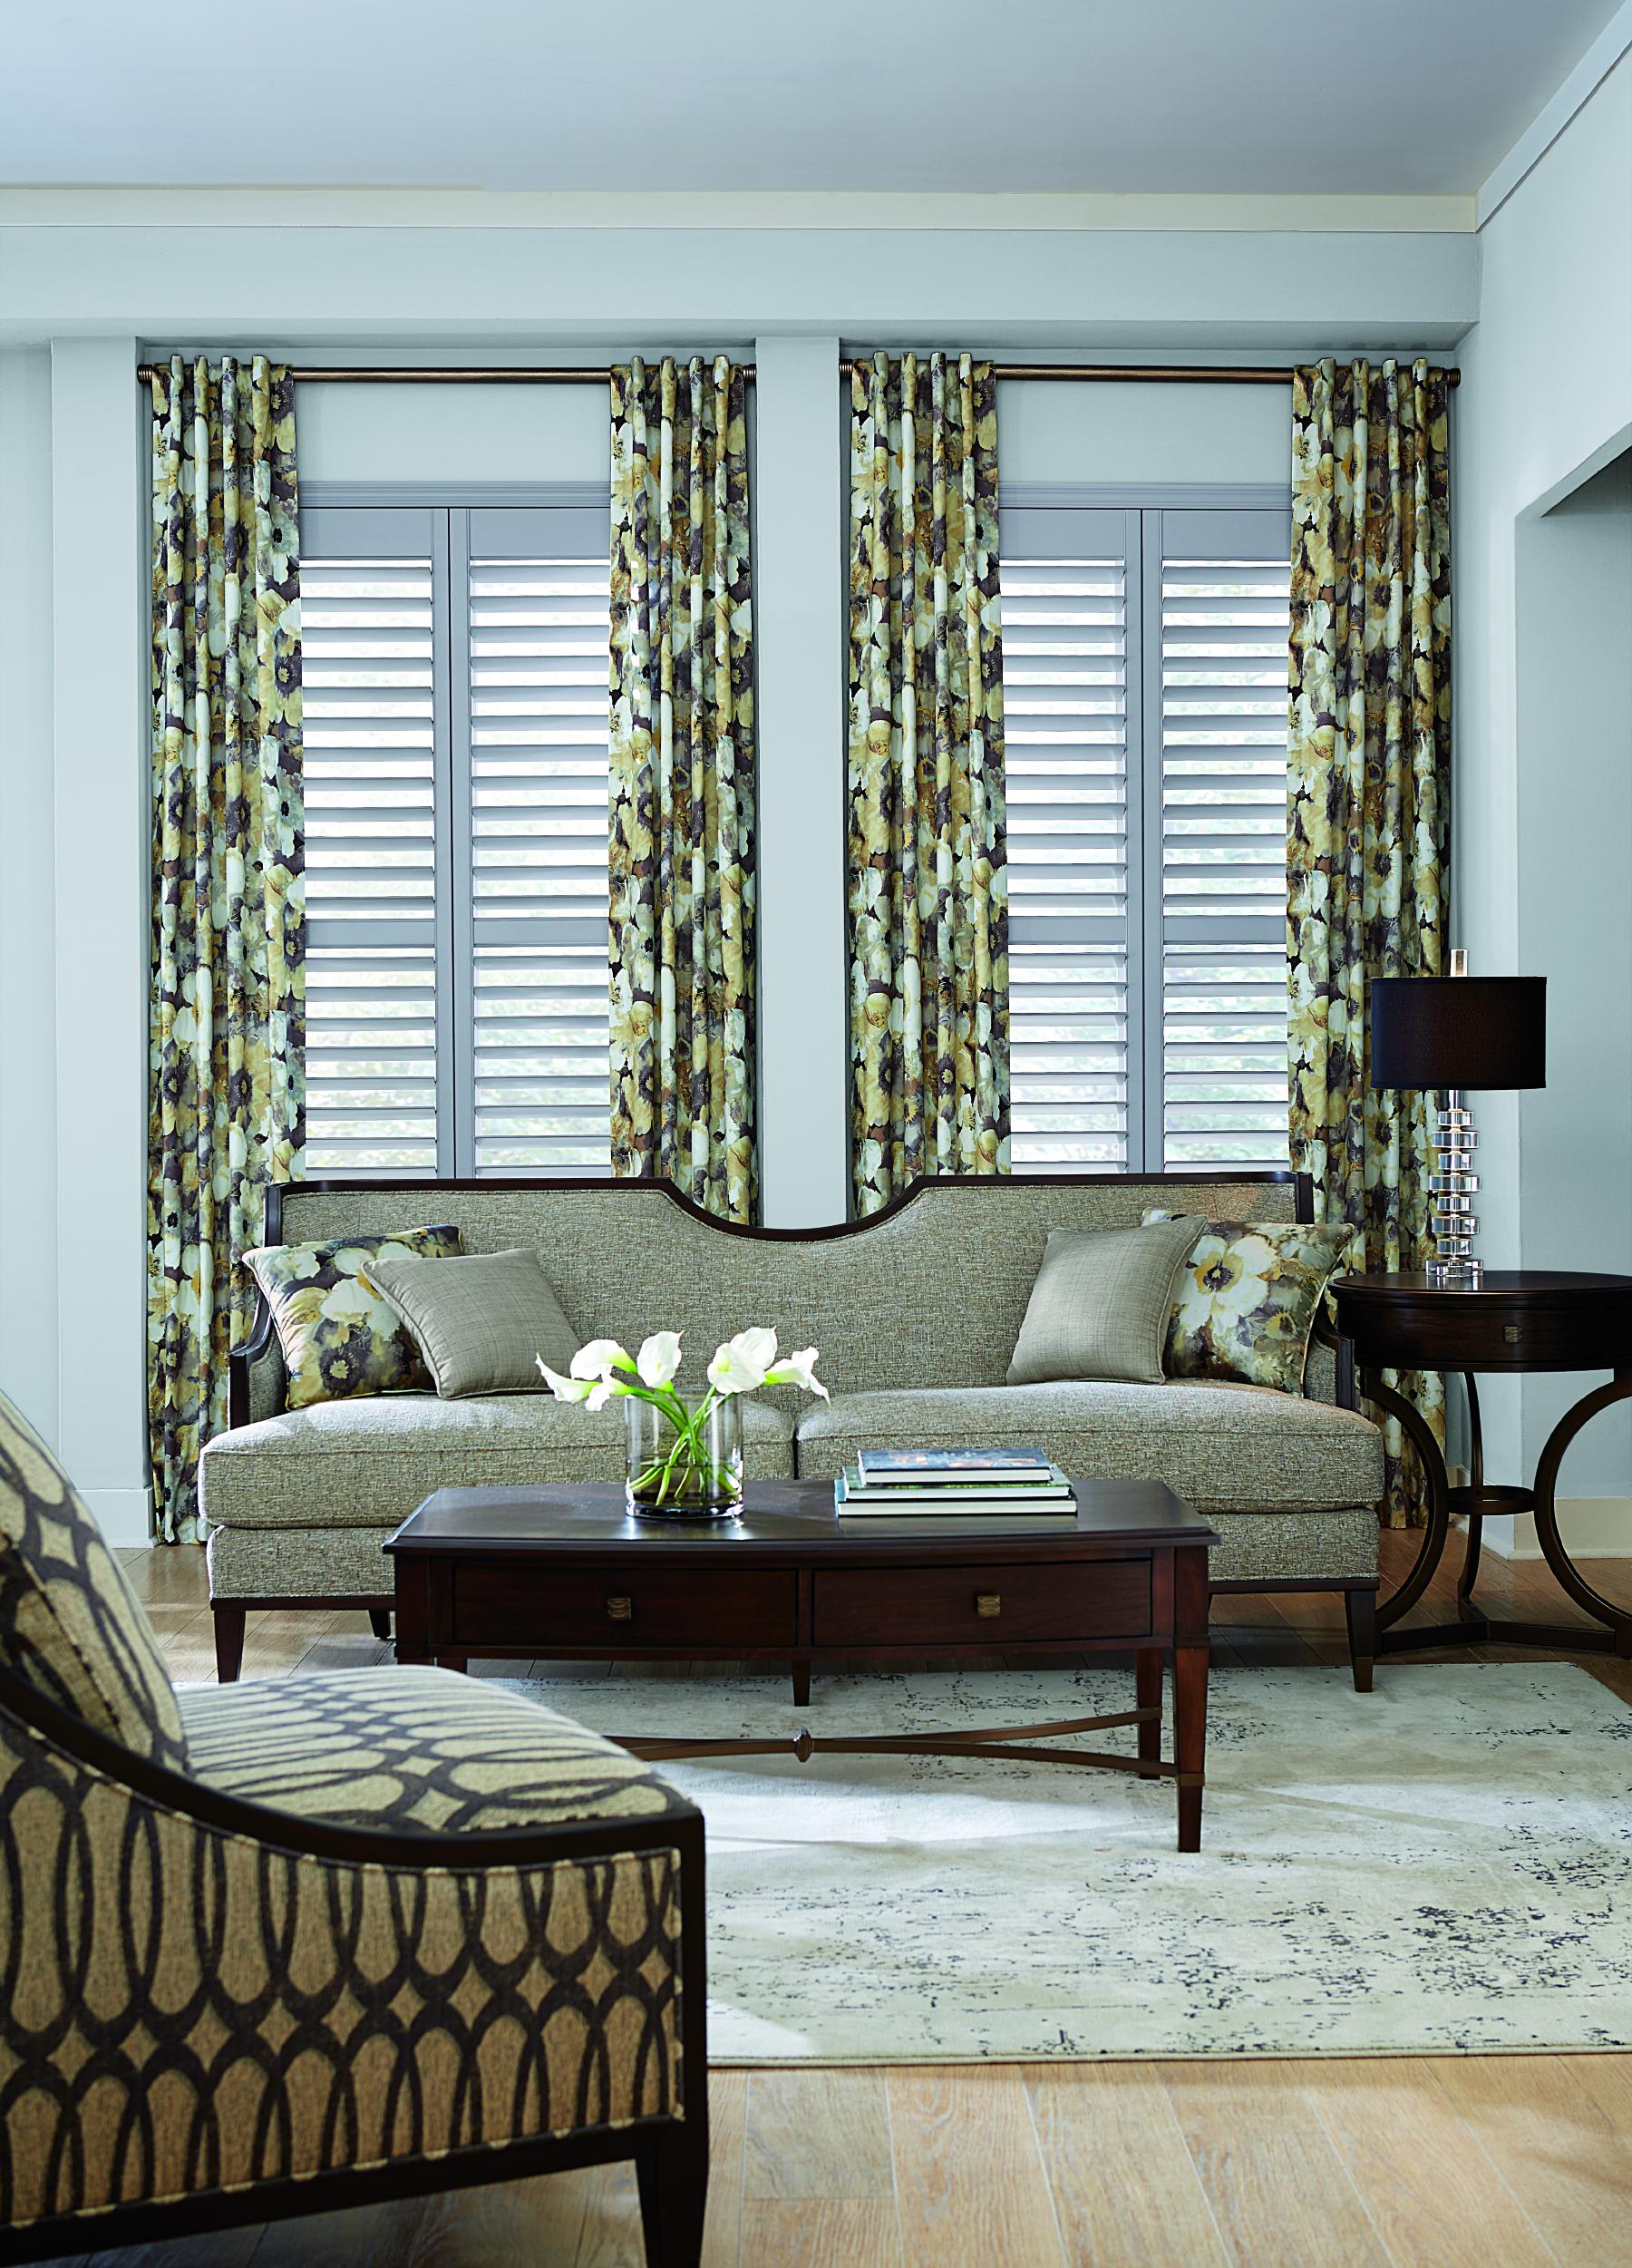 composite coverings interior window shutters libraryweb barbara santa fashions